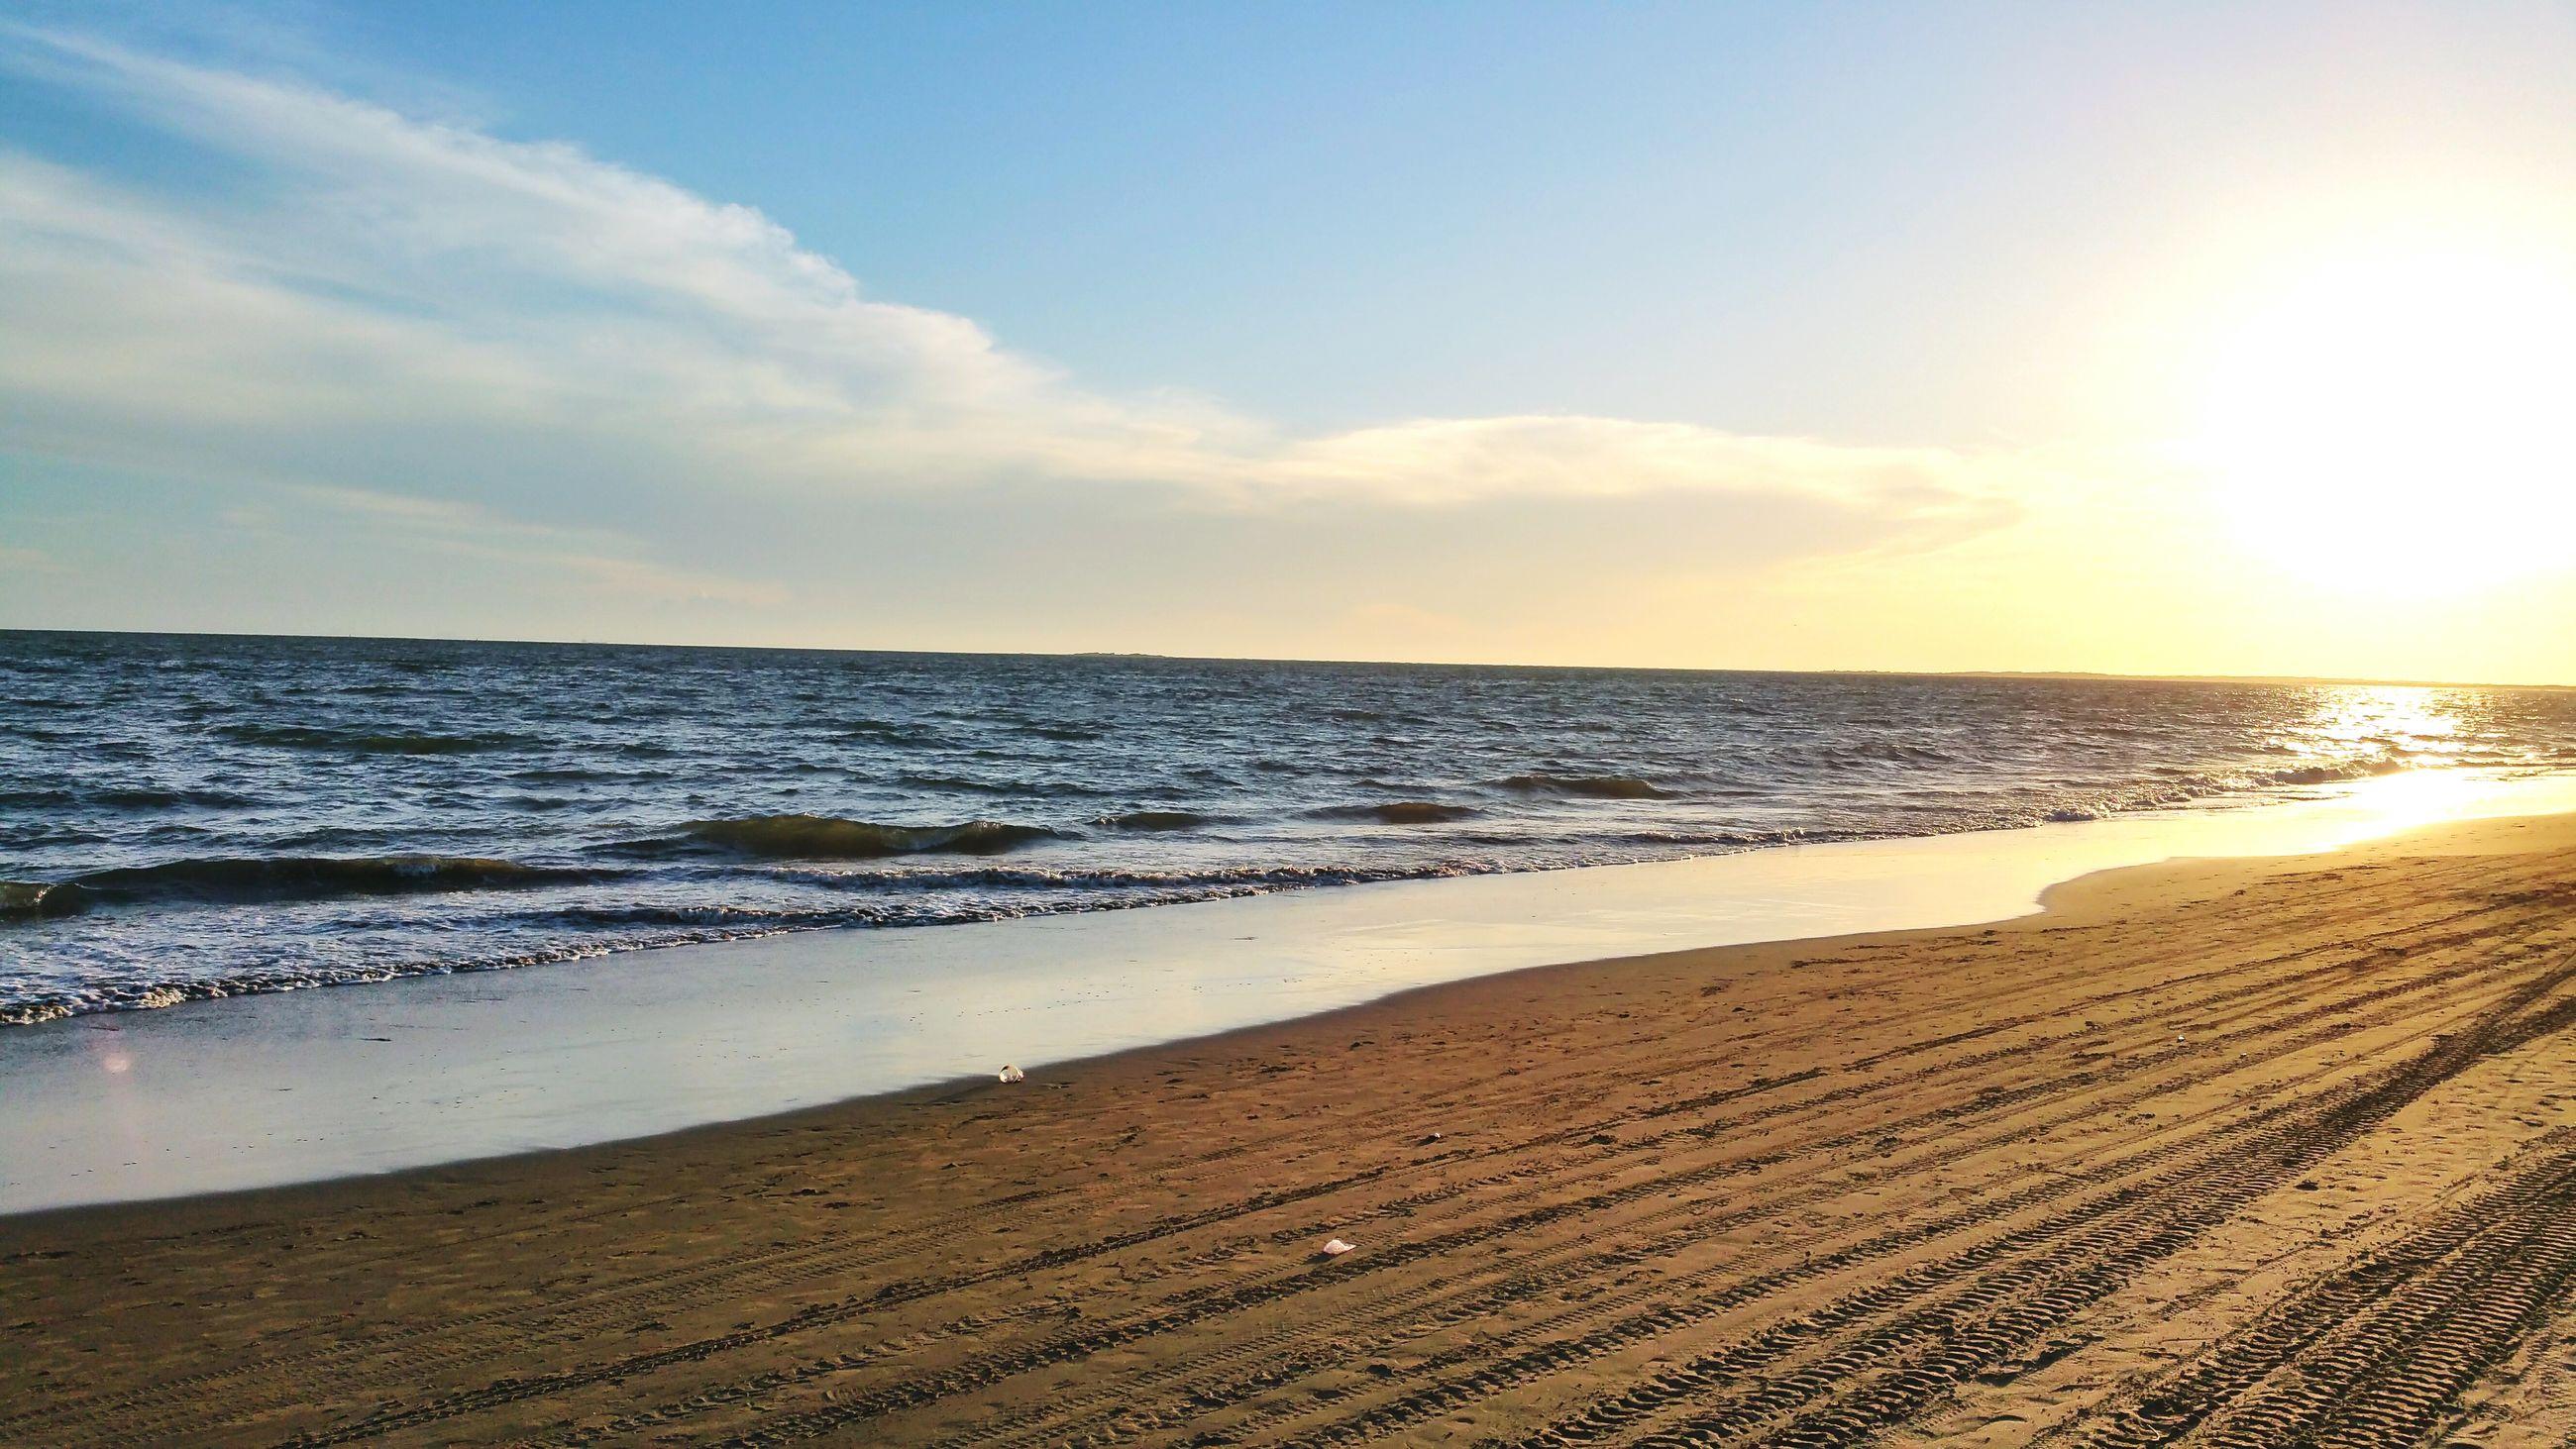 sea, beach, horizon over water, water, shore, sand, tranquil scene, scenics, tranquility, sky, beauty in nature, nature, sunset, idyllic, wave, sun, sunlight, coastline, outdoors, remote